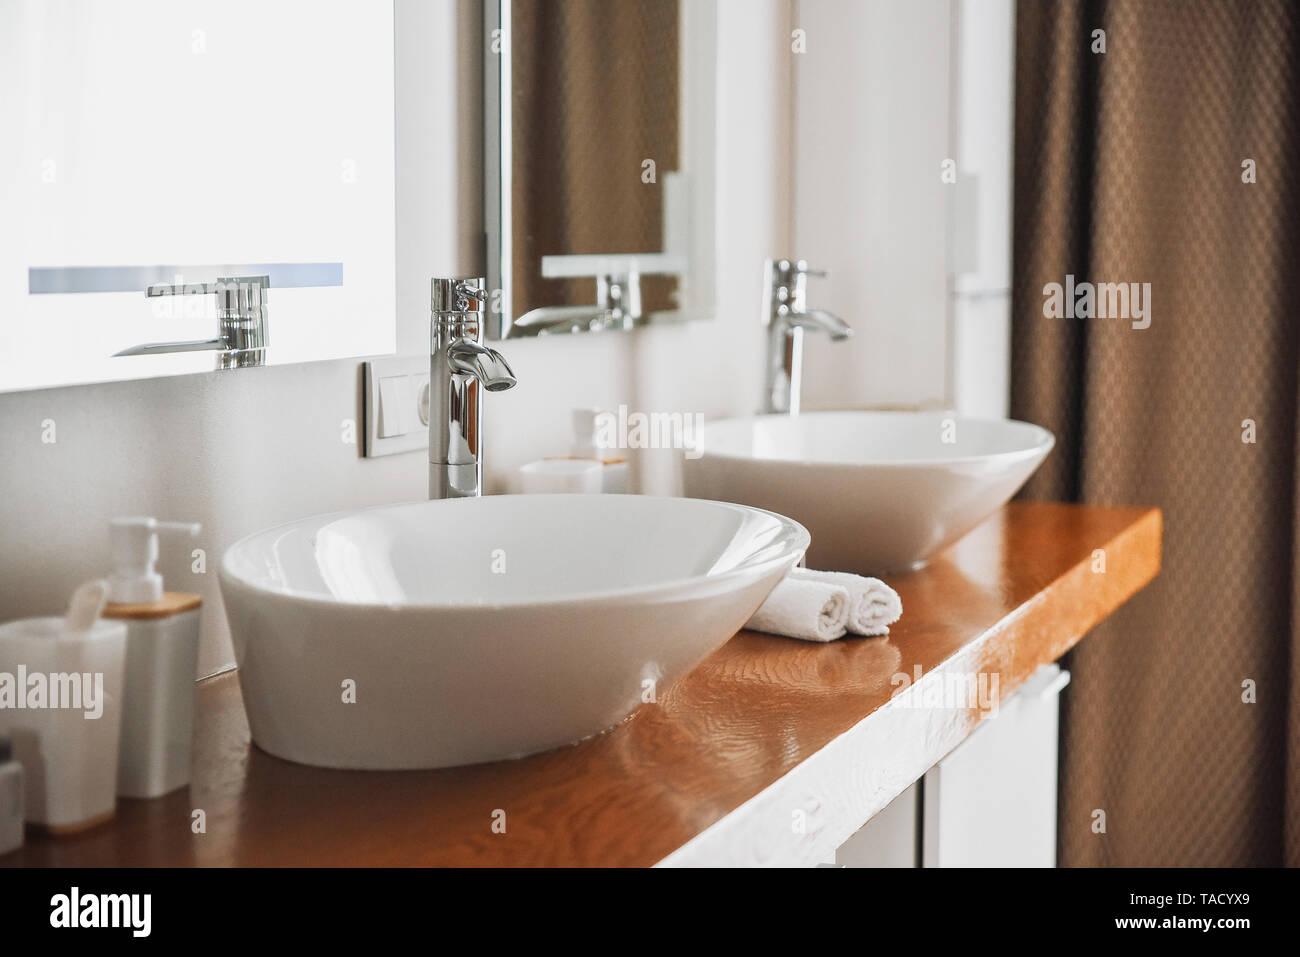 Moderne Badezimmer Einrichtung, tolles Design. Modernes Bad ...